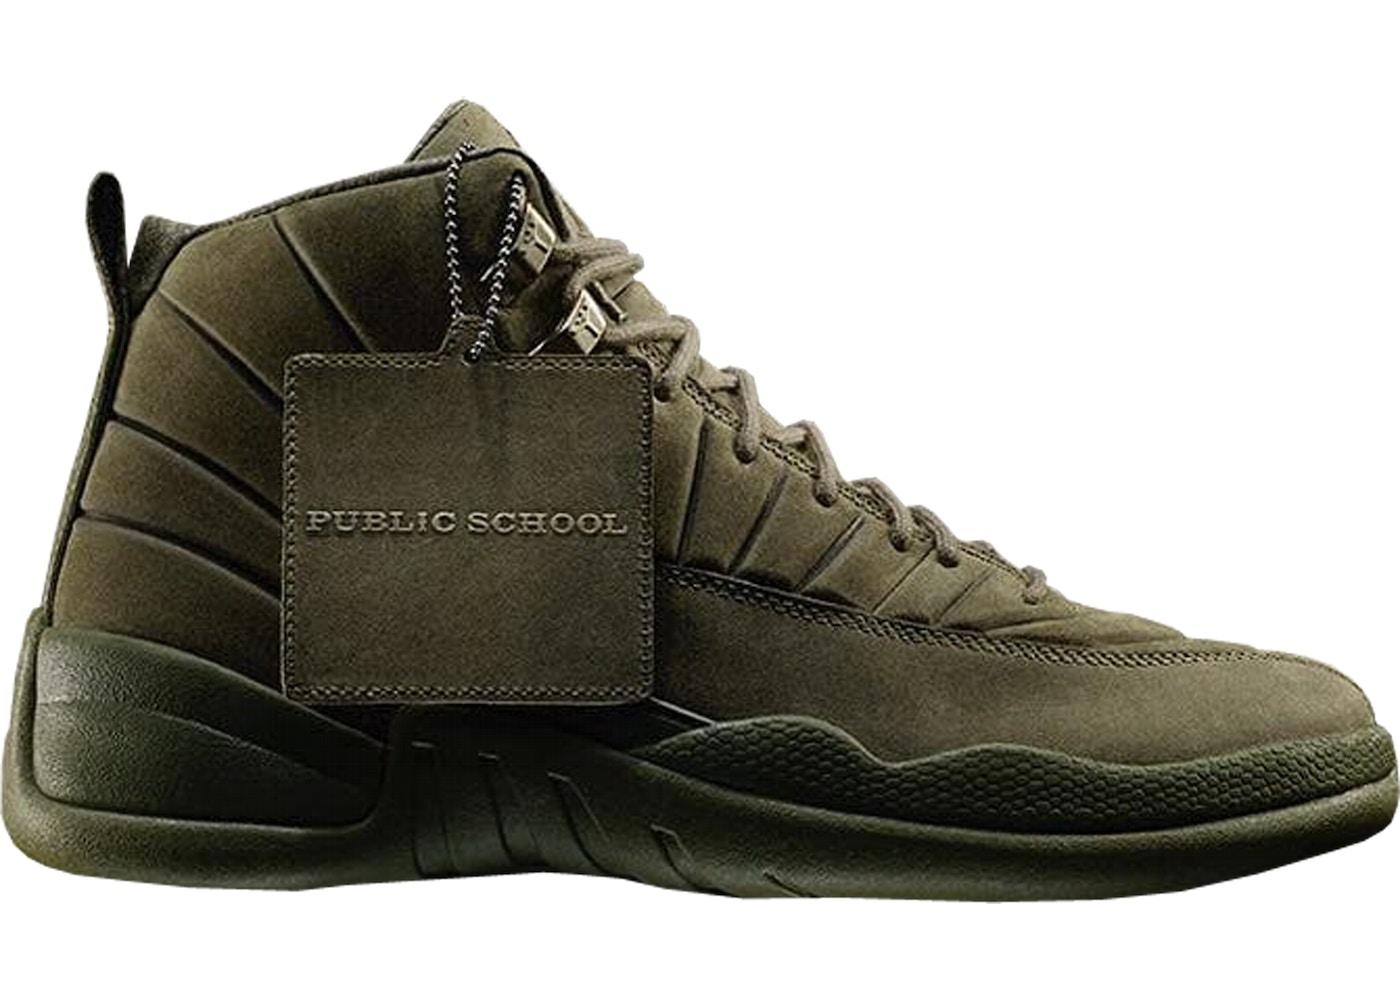 fedc103611c6cd Buy Air Jordan 12 Shoes   Deadstock Sneakers